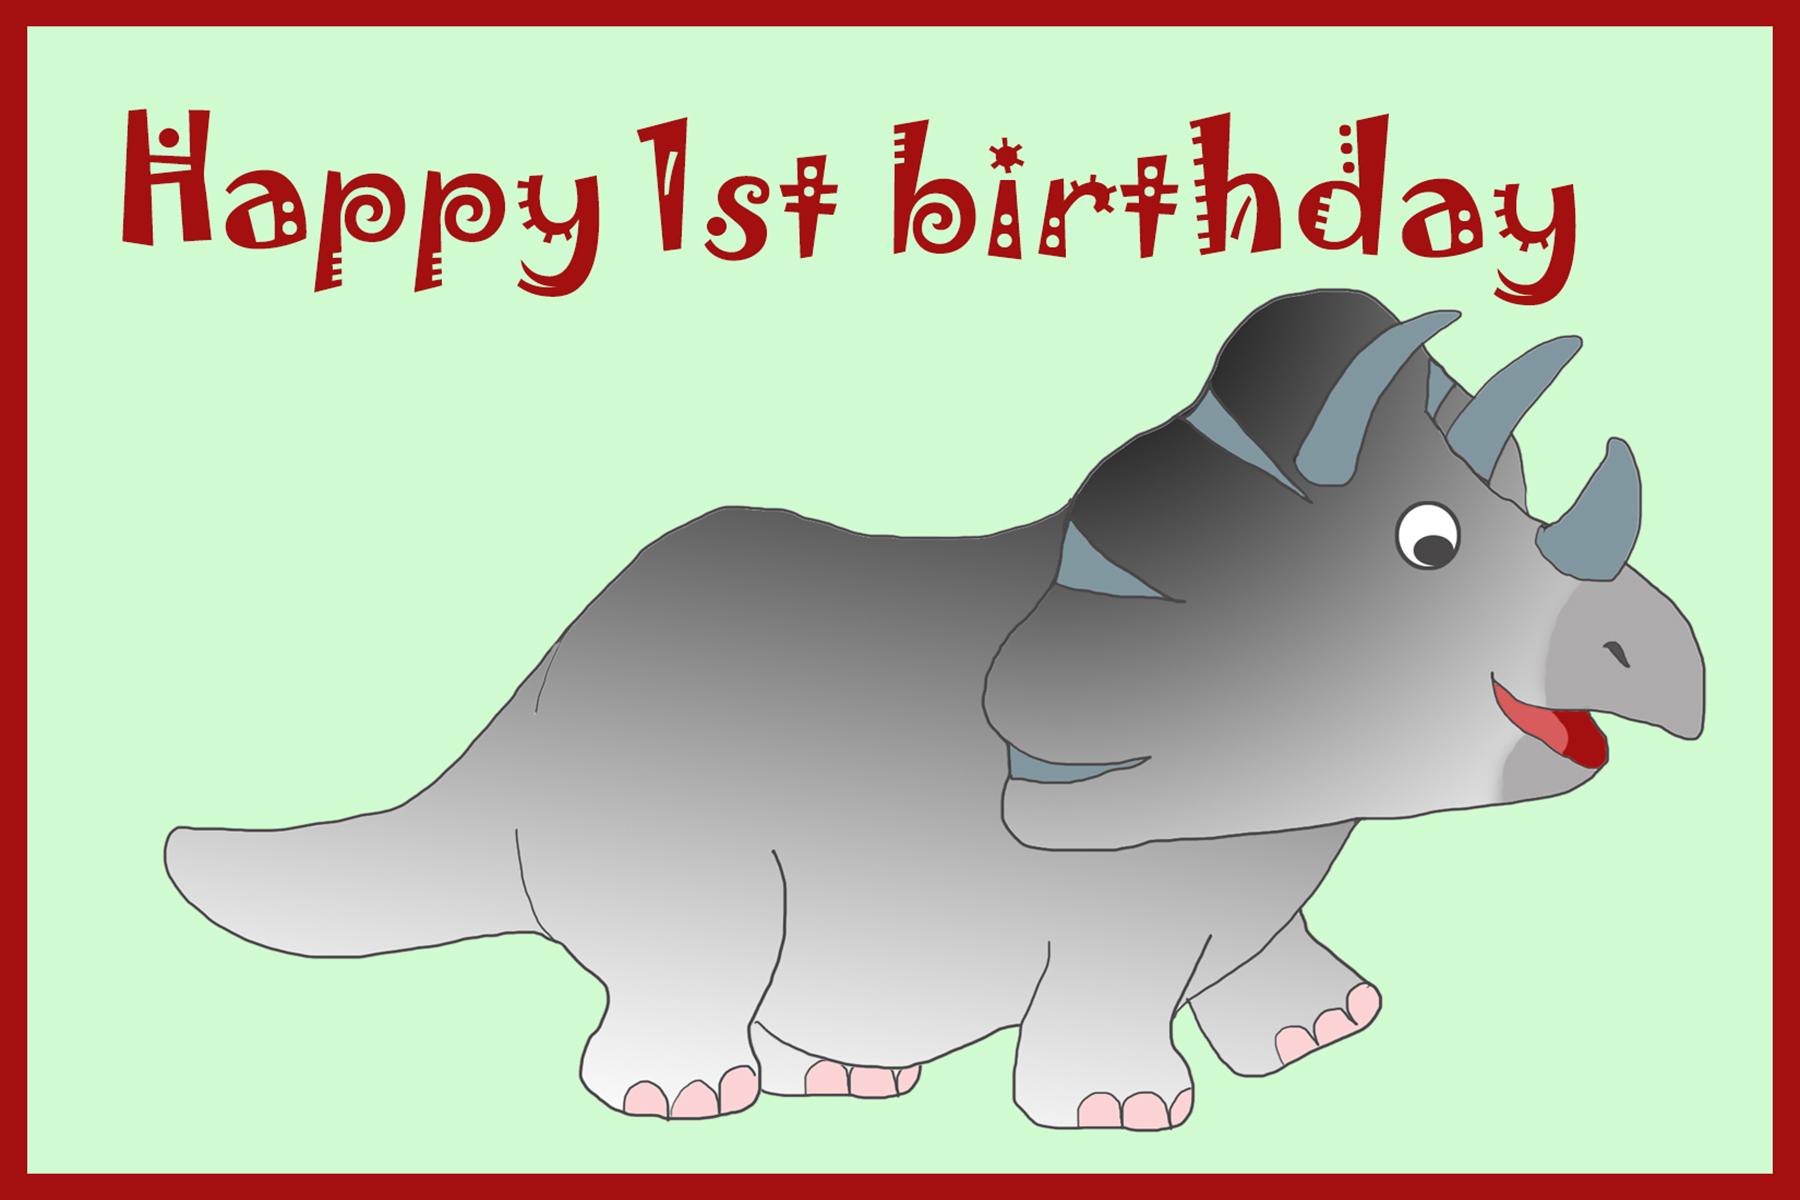 katmosaurus birthday card 1st birthday